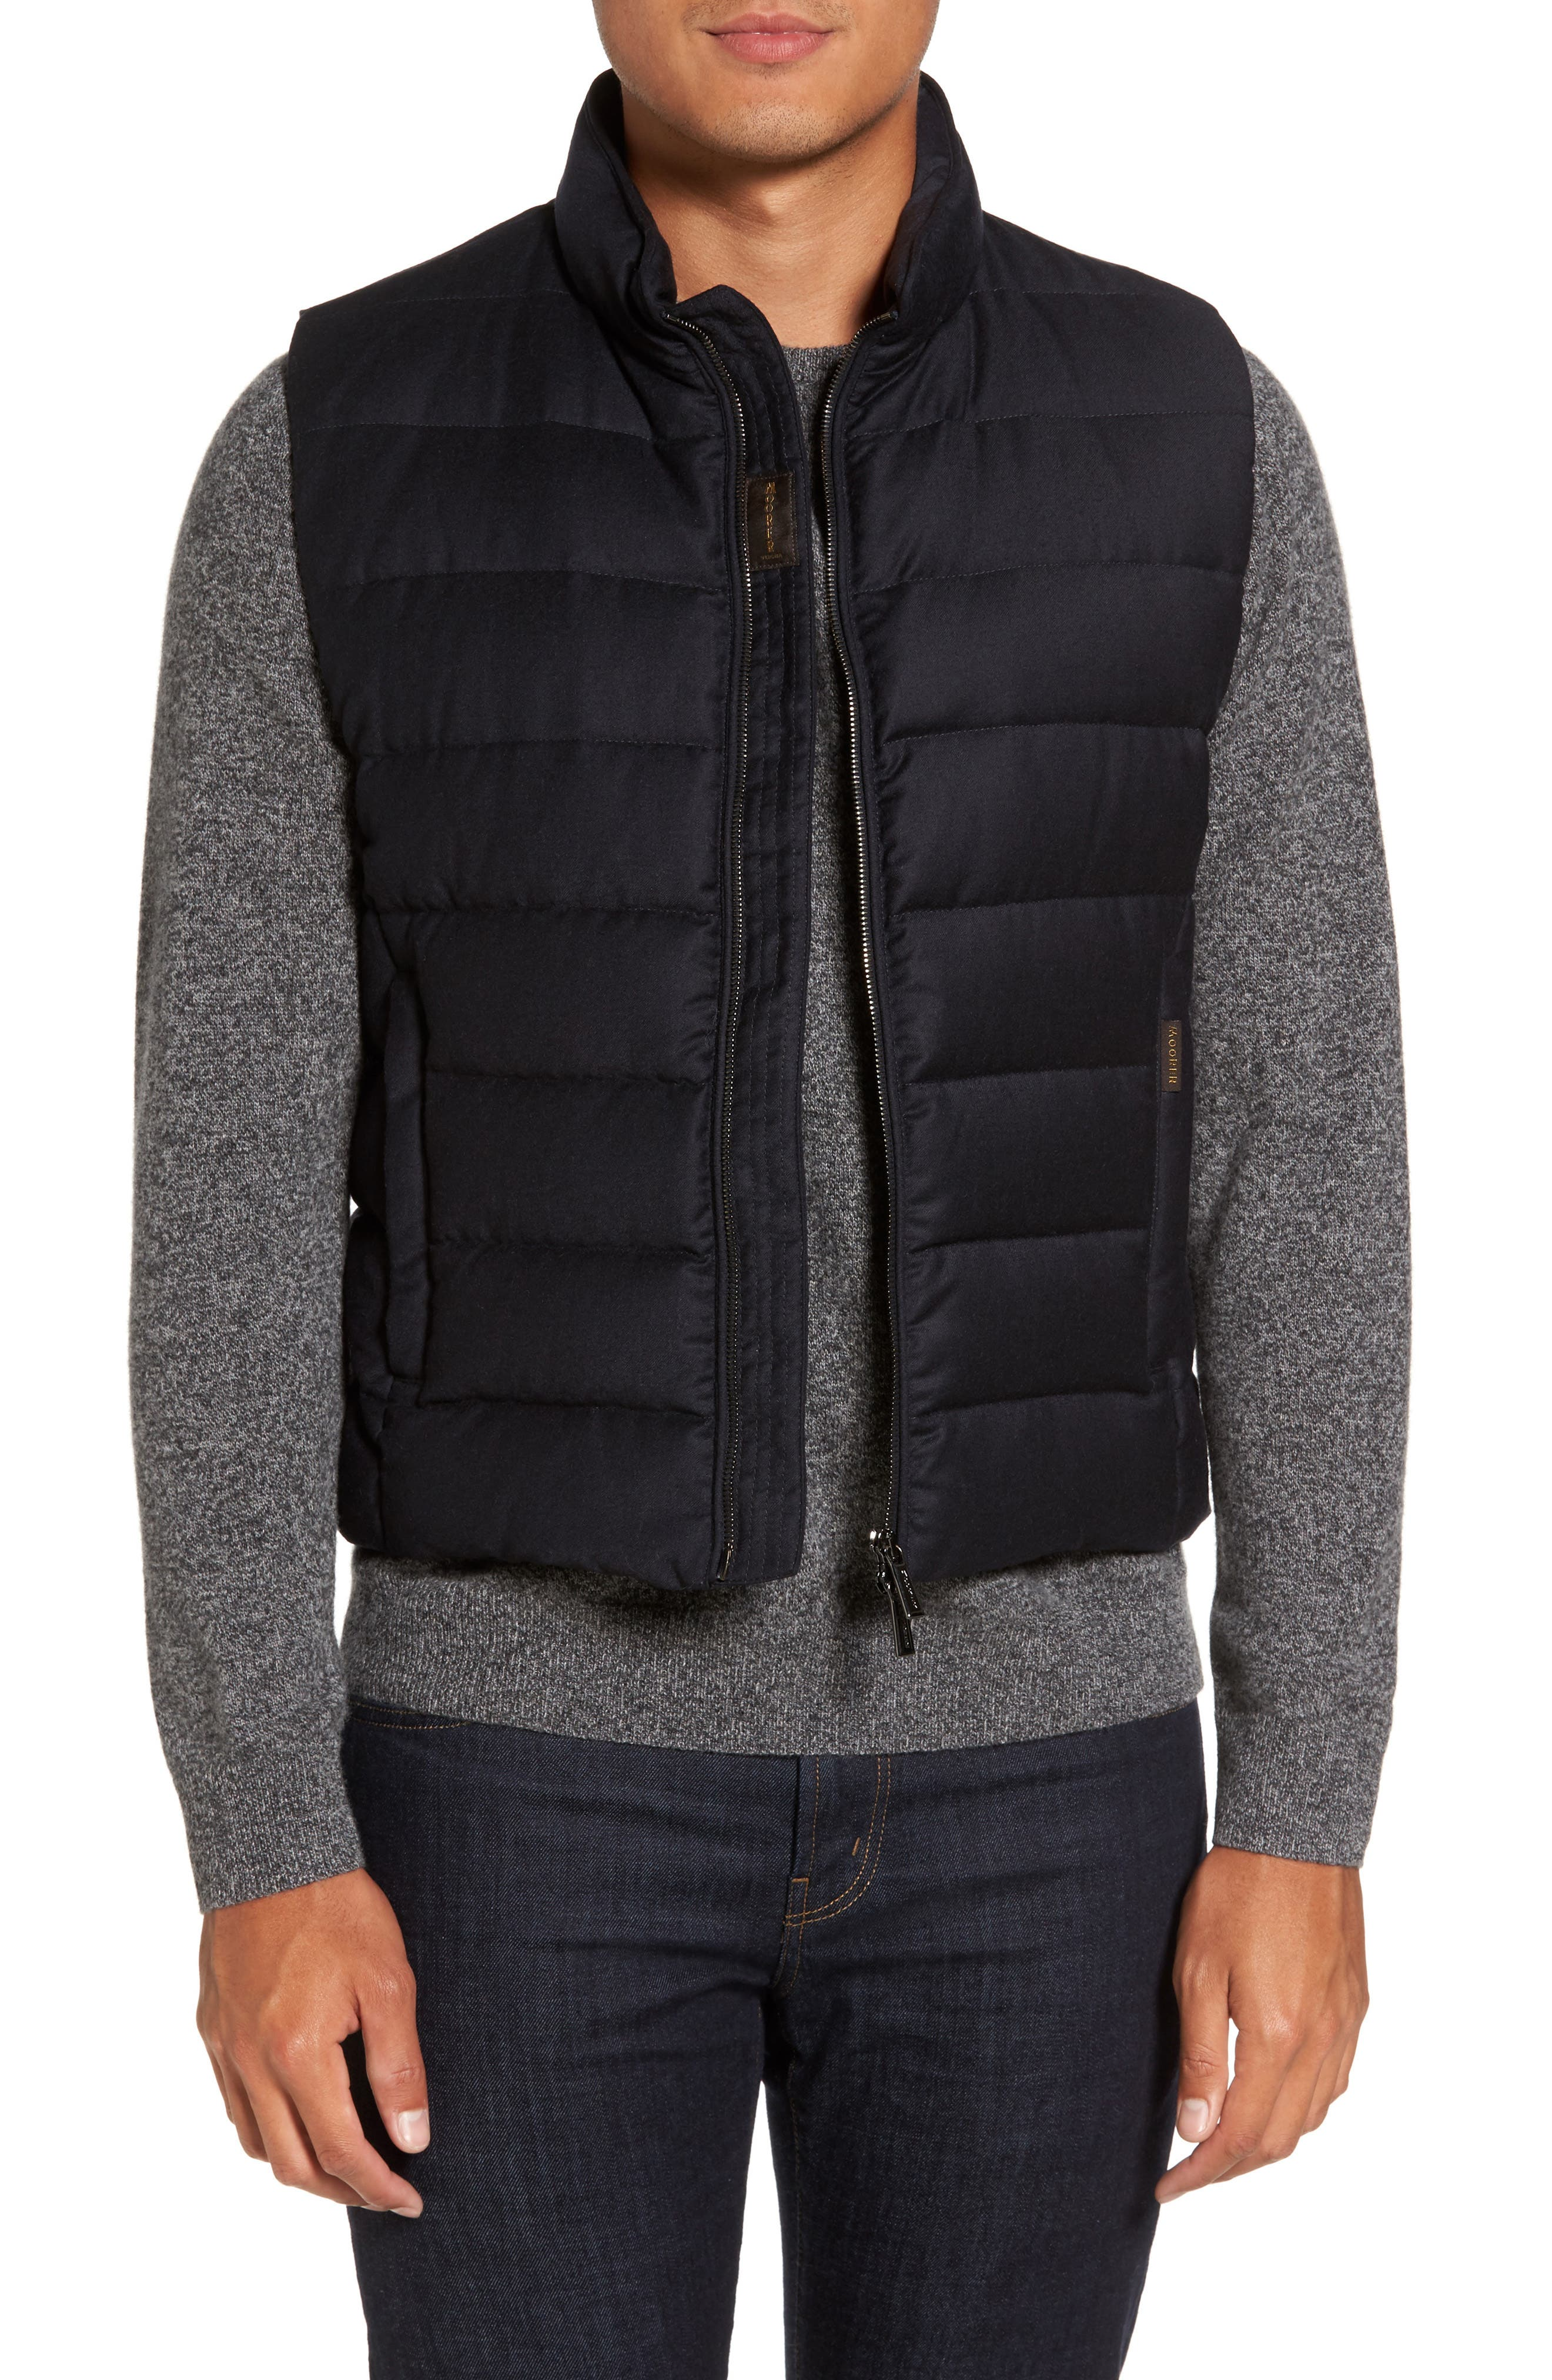 Oliver L Wool & Cashmere Flannel Waterproof Vest,                         Main,                         color, Blue